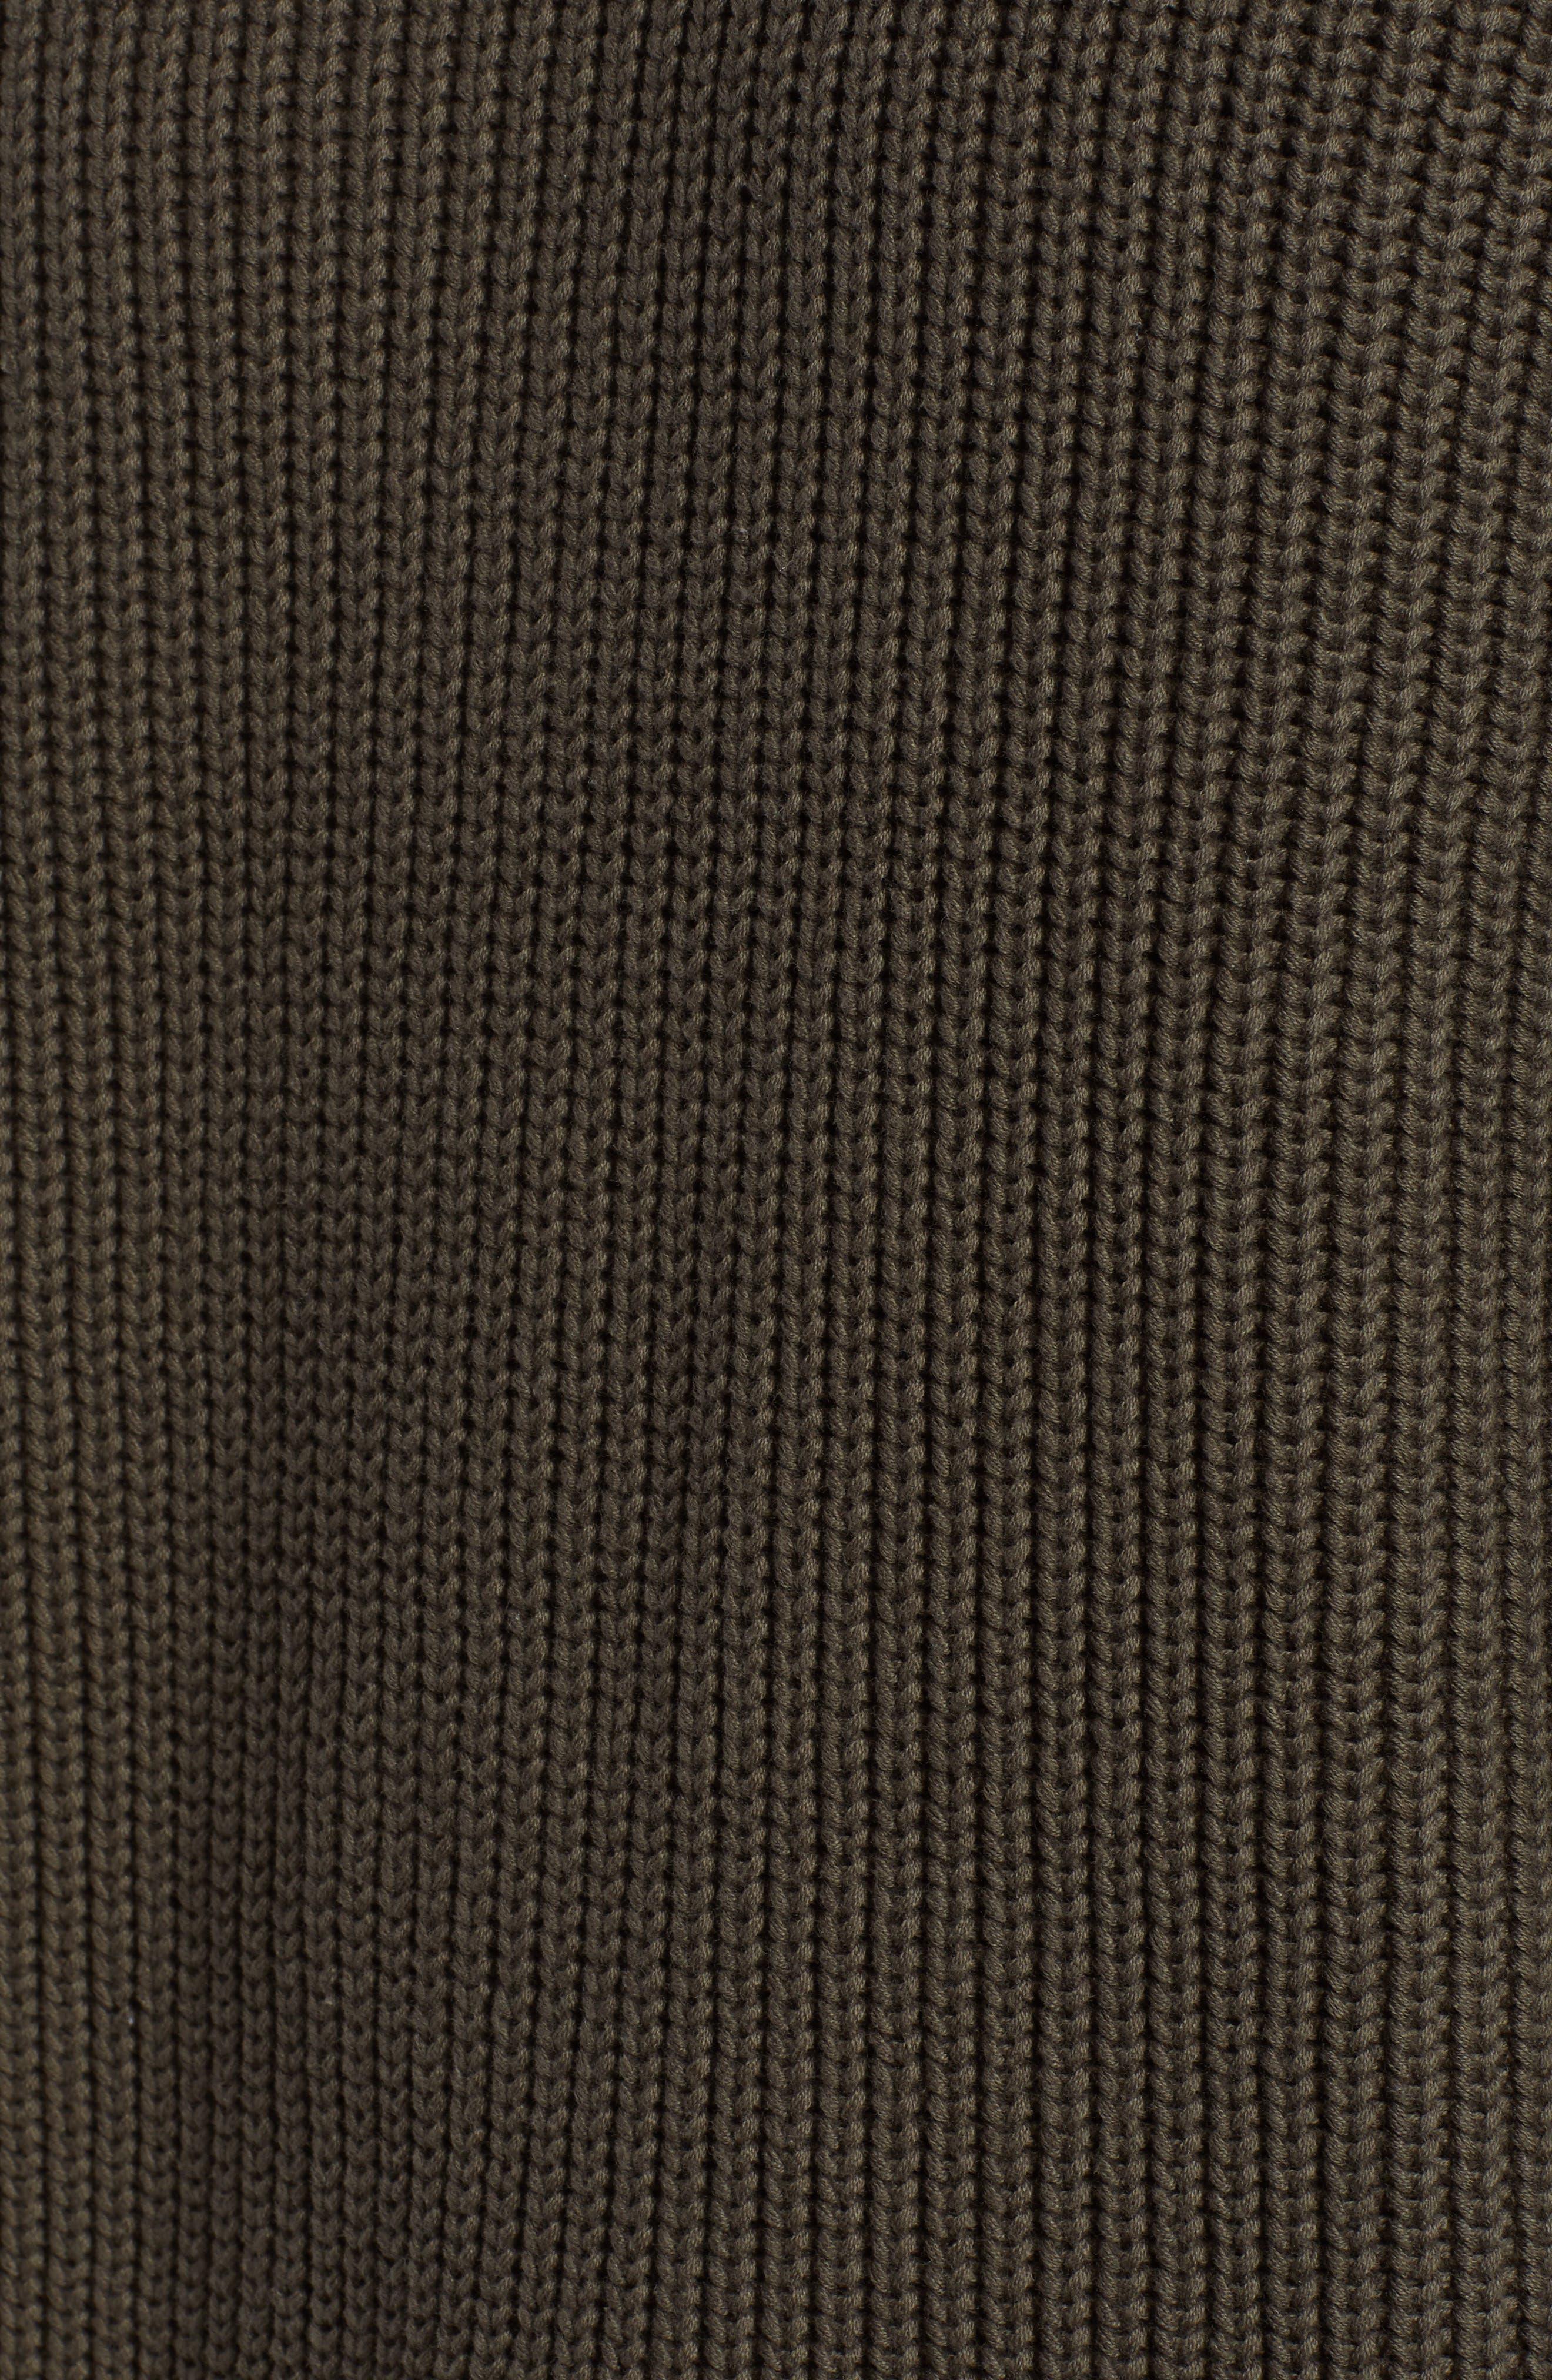 Jett Slim Fit Crewneck Sweater,                             Alternate thumbnail 5, color,                             OAK GROVE/ BLACK